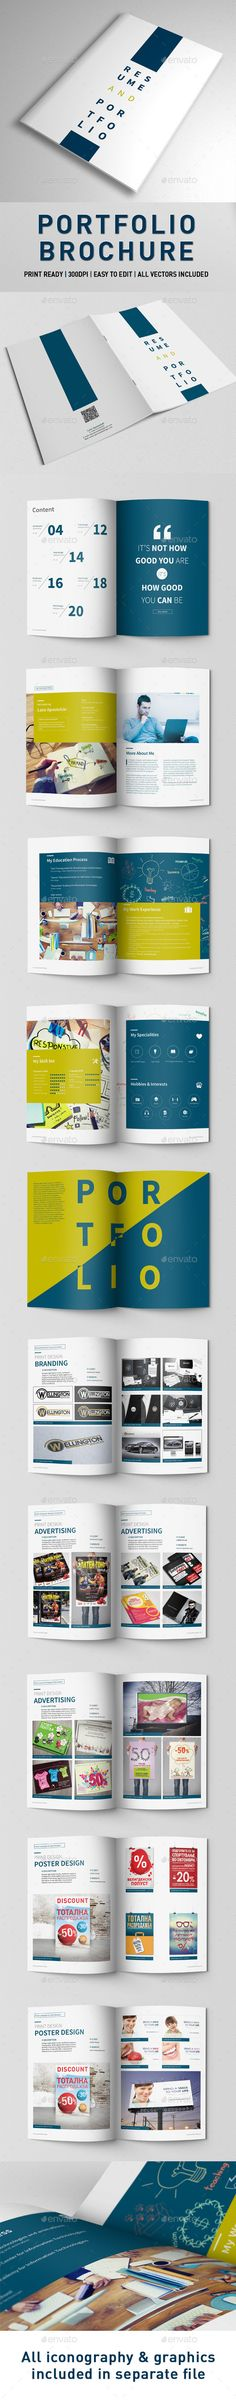 Portfolio Brochure Template #brochuretemplate Download: http://graphicriver.net/item/portfolio-brochure/9935095?ref=ksioks